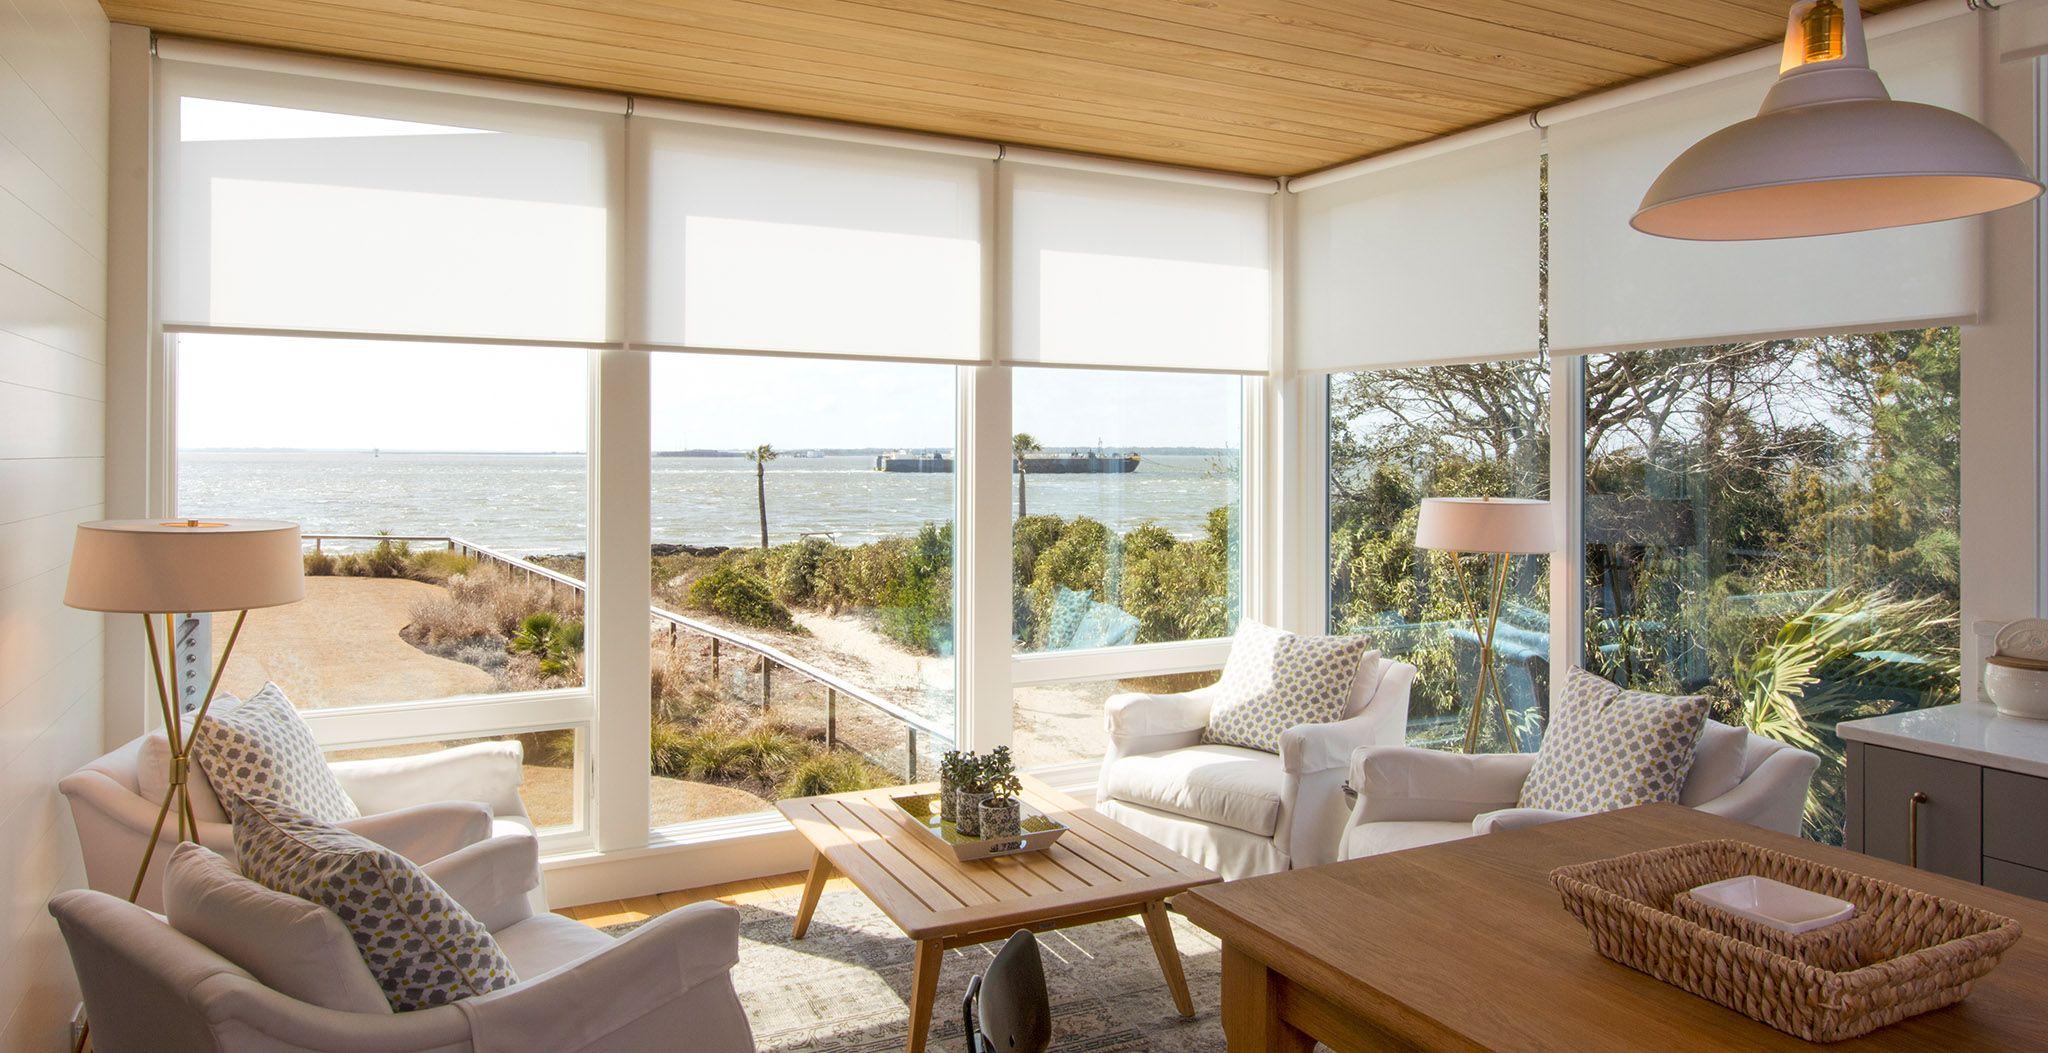 J Geiger Modern Window Shades Modern Window Coverings Contemporary Window Coverings